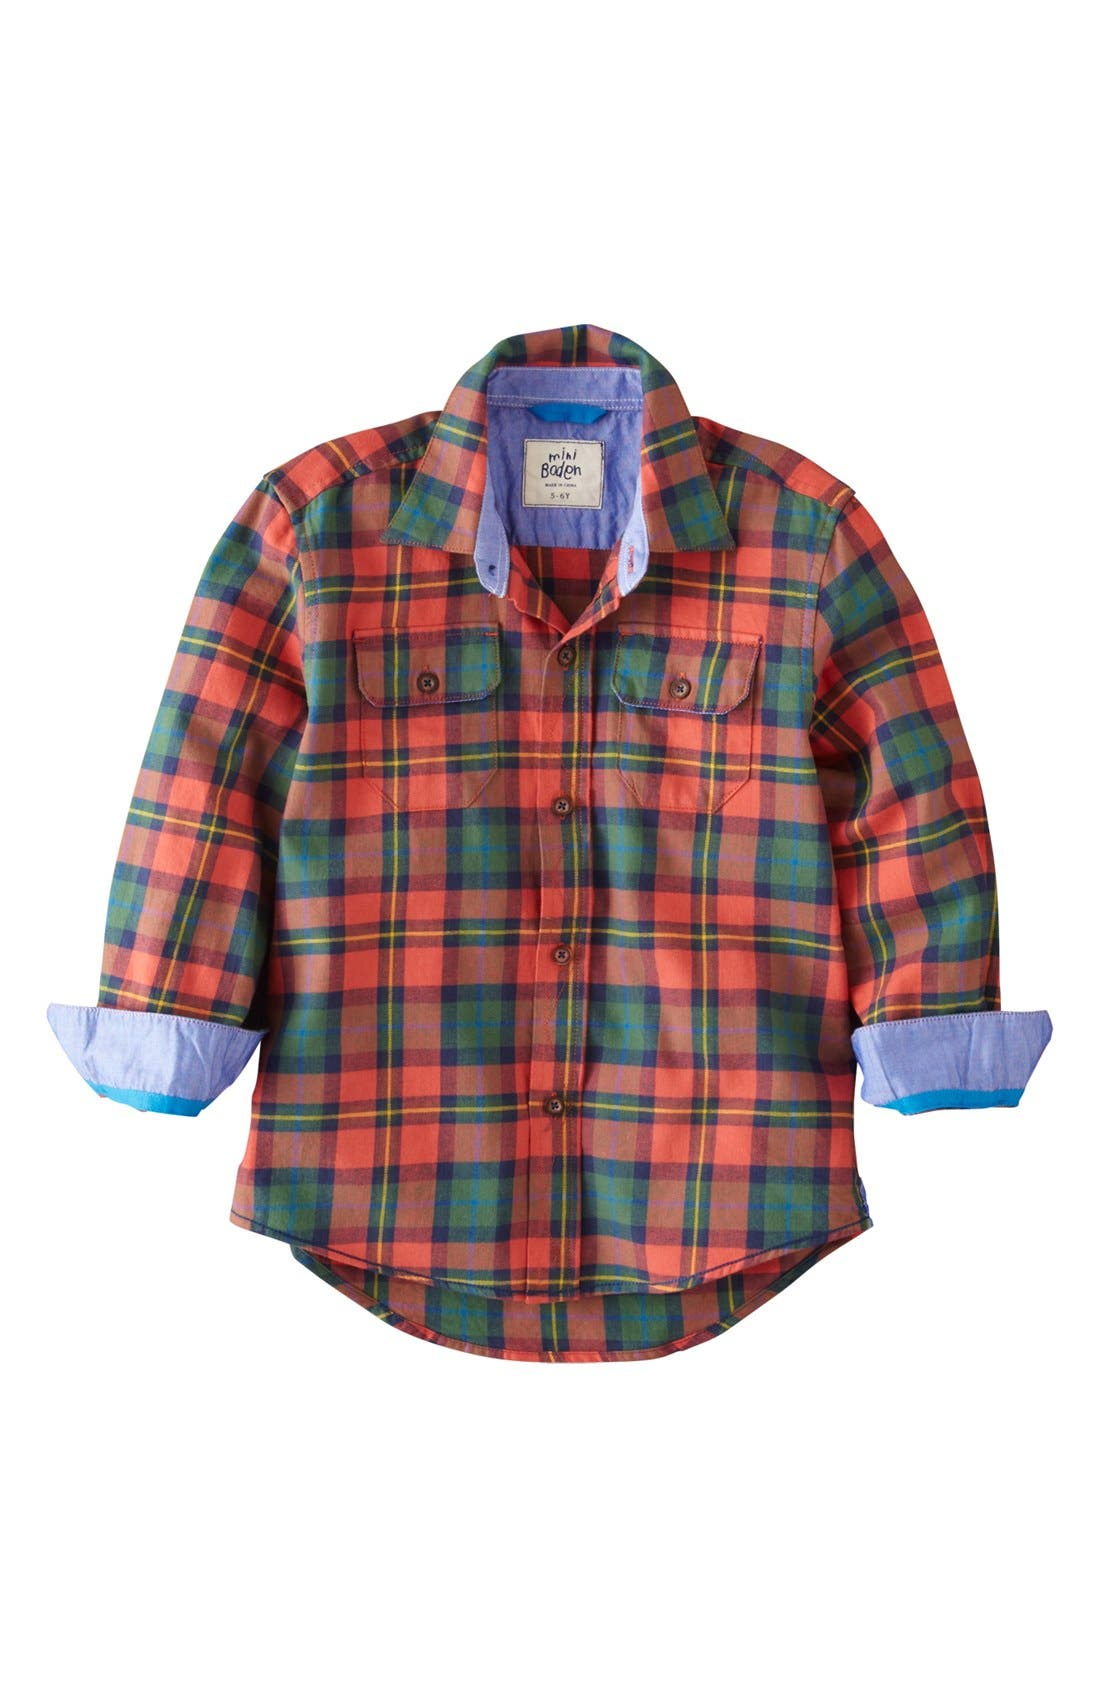 Alternate Image 1 Selected - Mini Boden Brushed Check Shirt (Toddler, Little Boys & Big Boys)